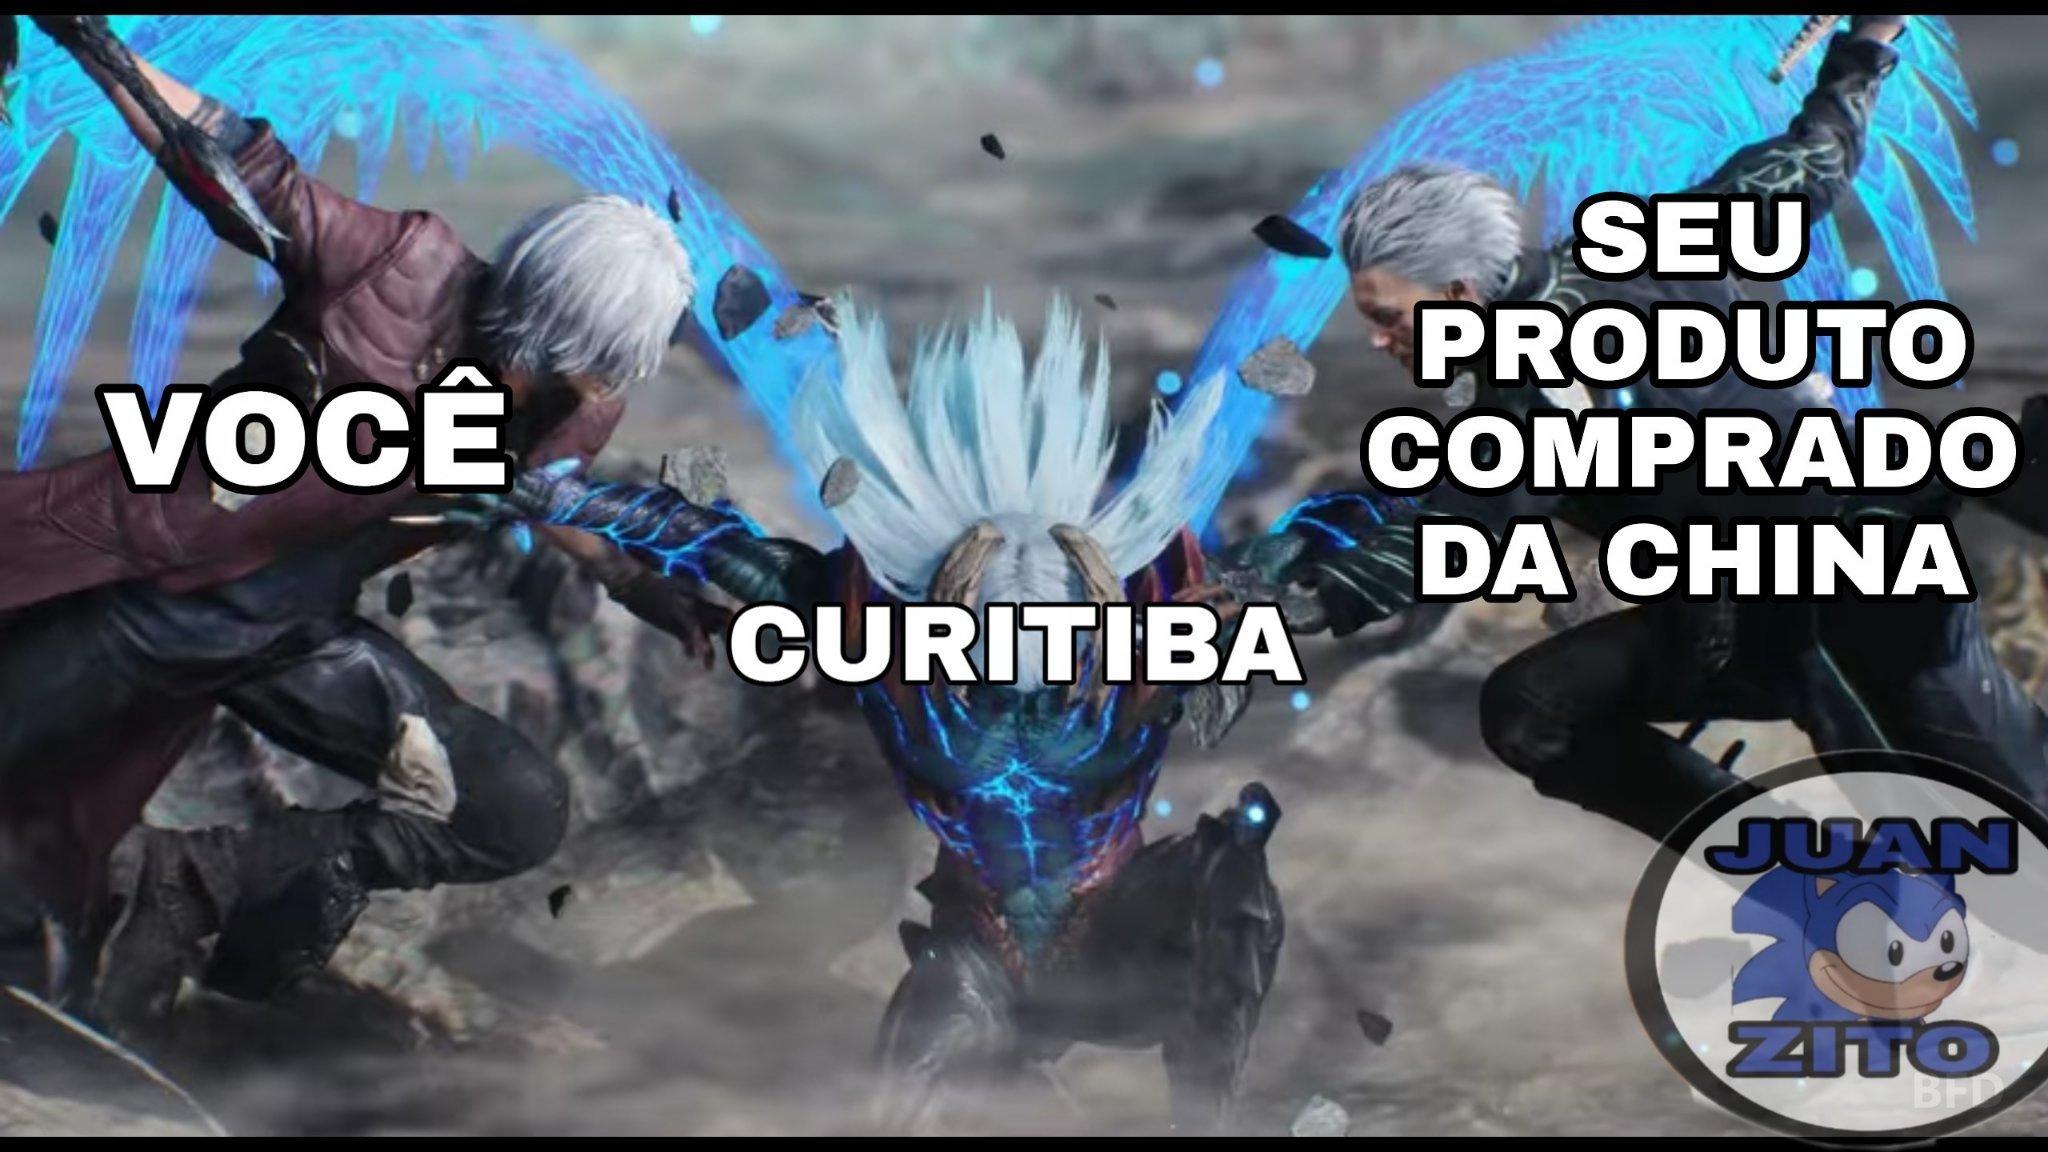 Privatiza logo essa merda Paulo guedes pfvr - meme